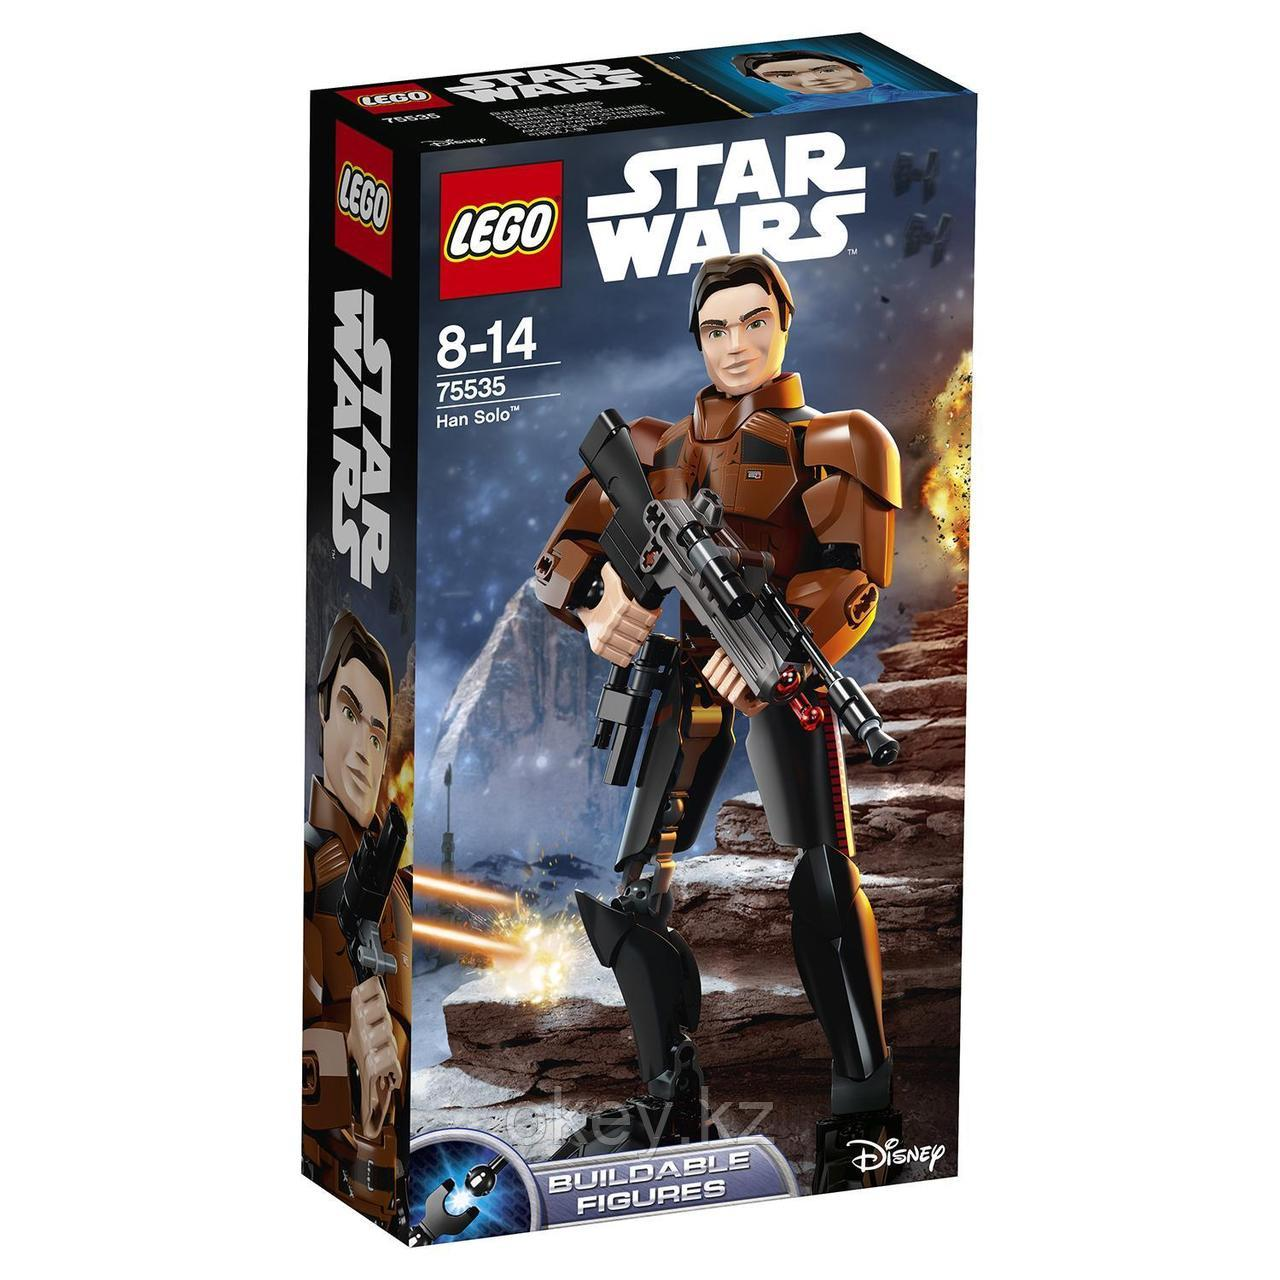 LEGO Star Wars: Хан Соло 75535